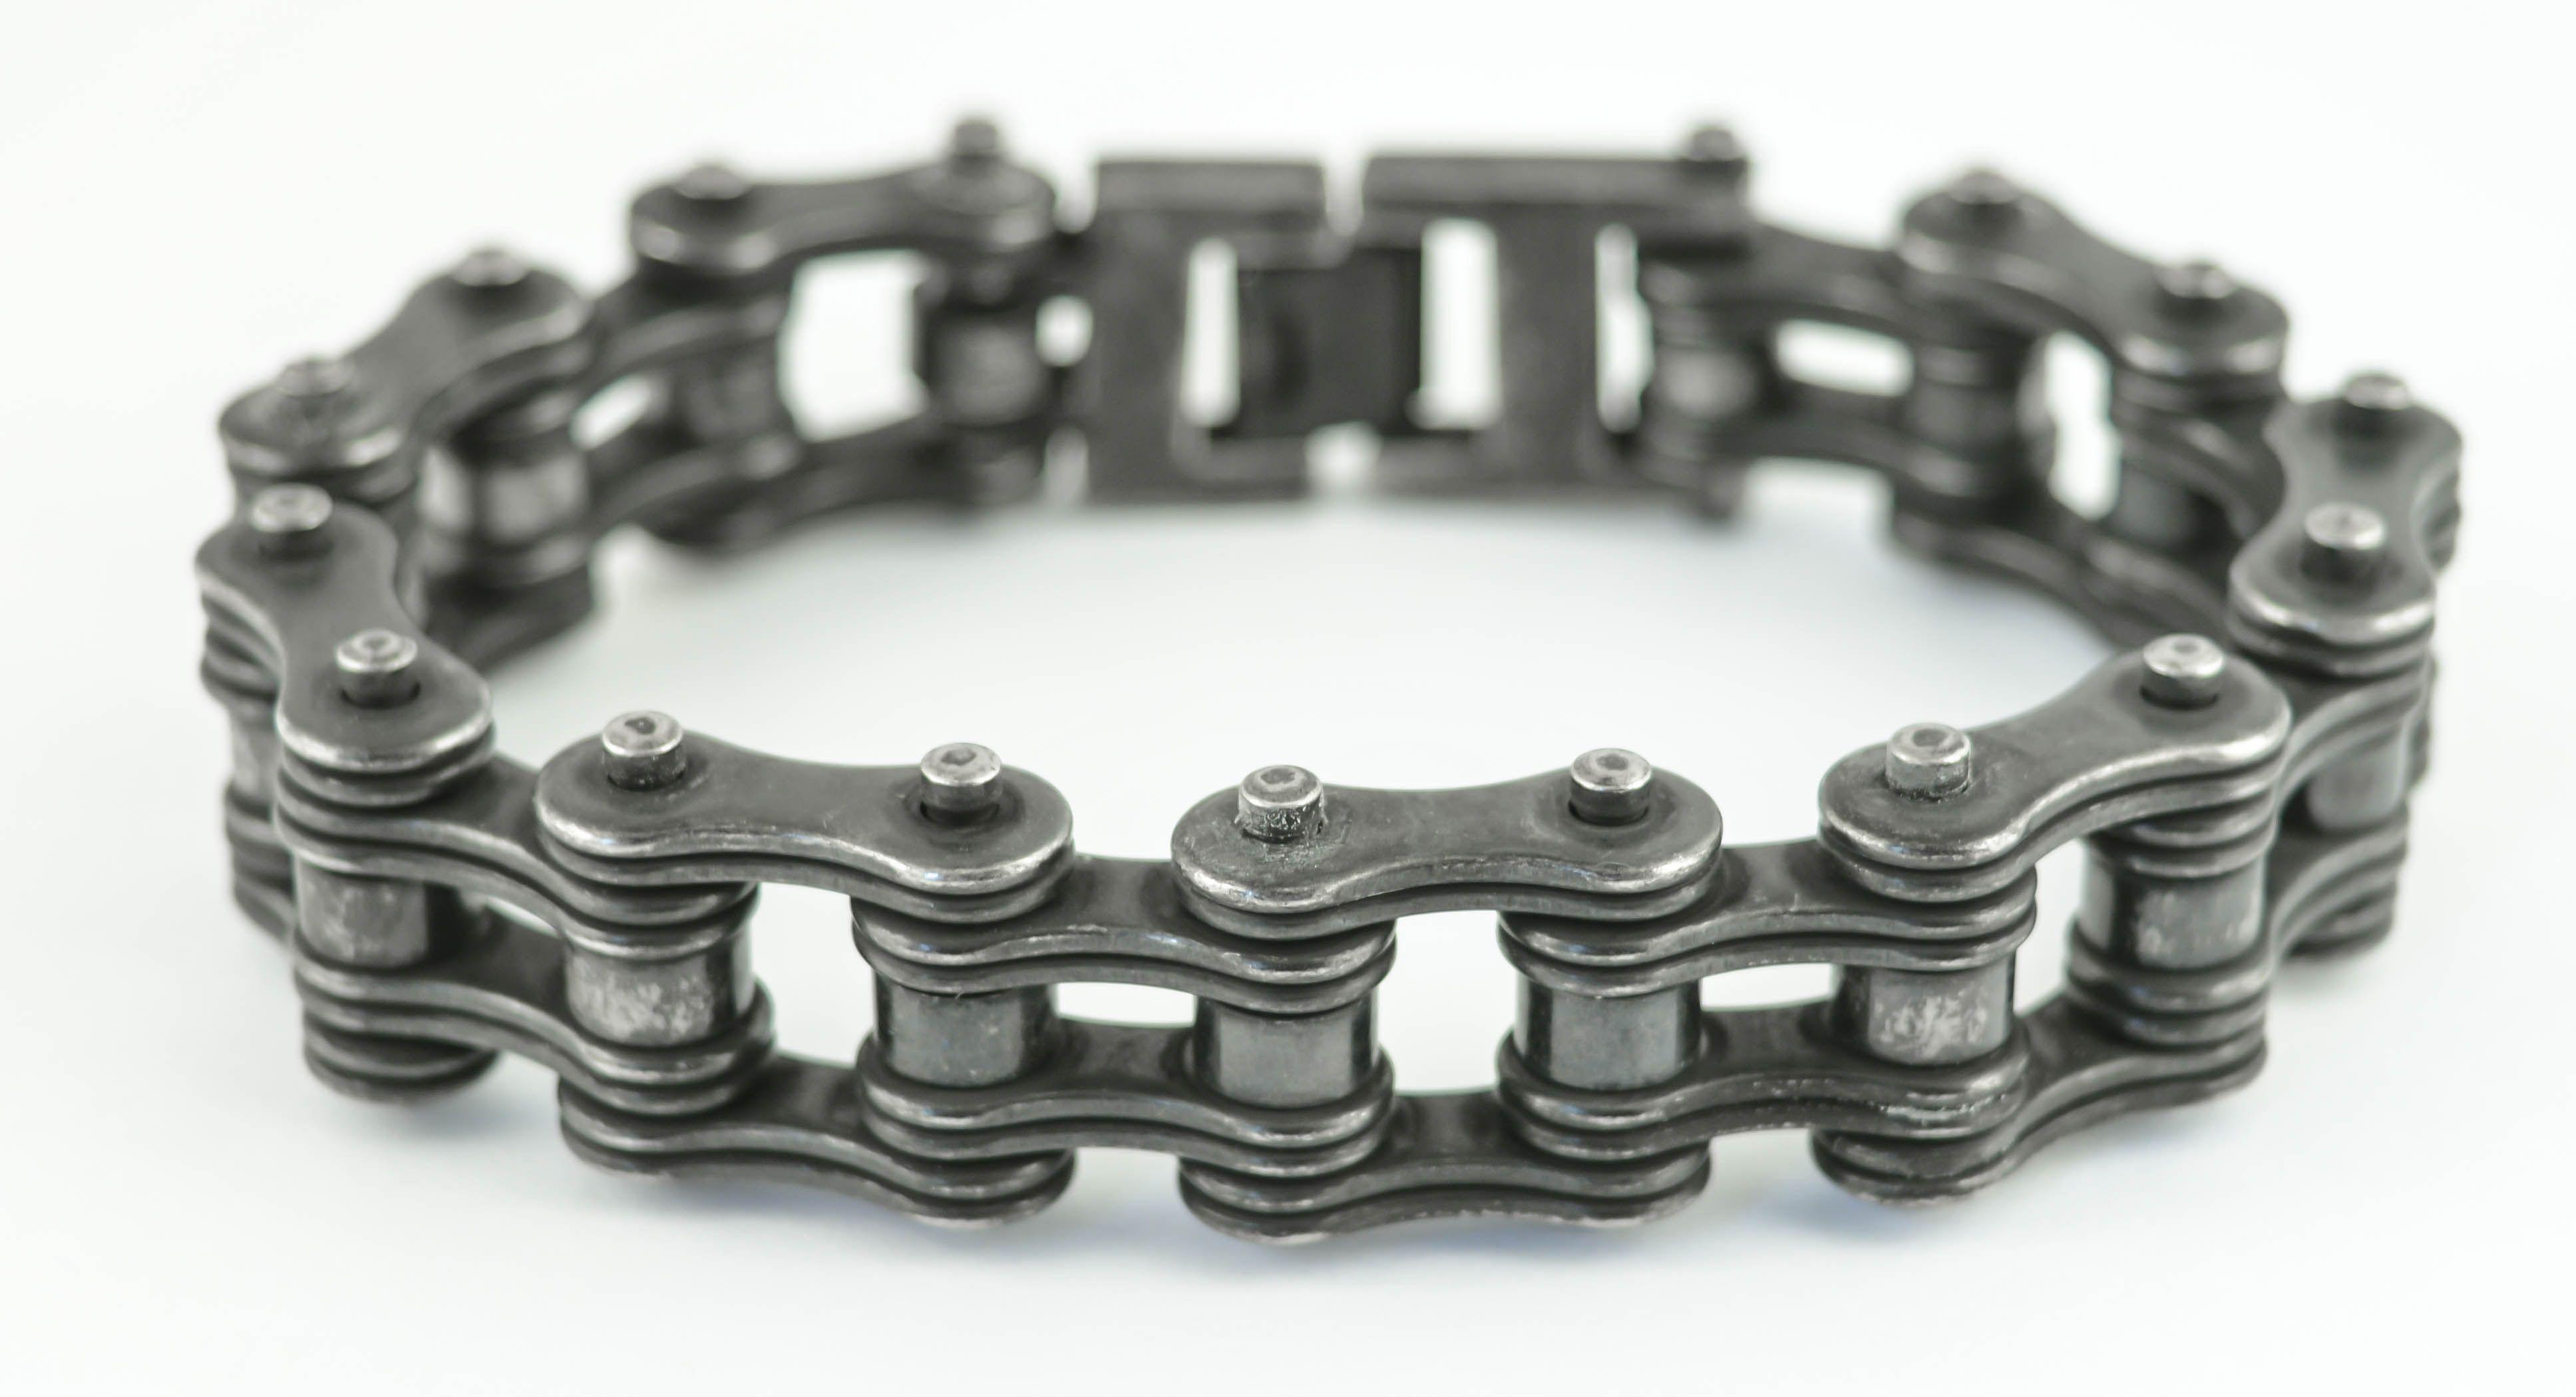 Motorcycle skull bike biker jewelry bracelets earrings rings and pendants made from stainless steeel